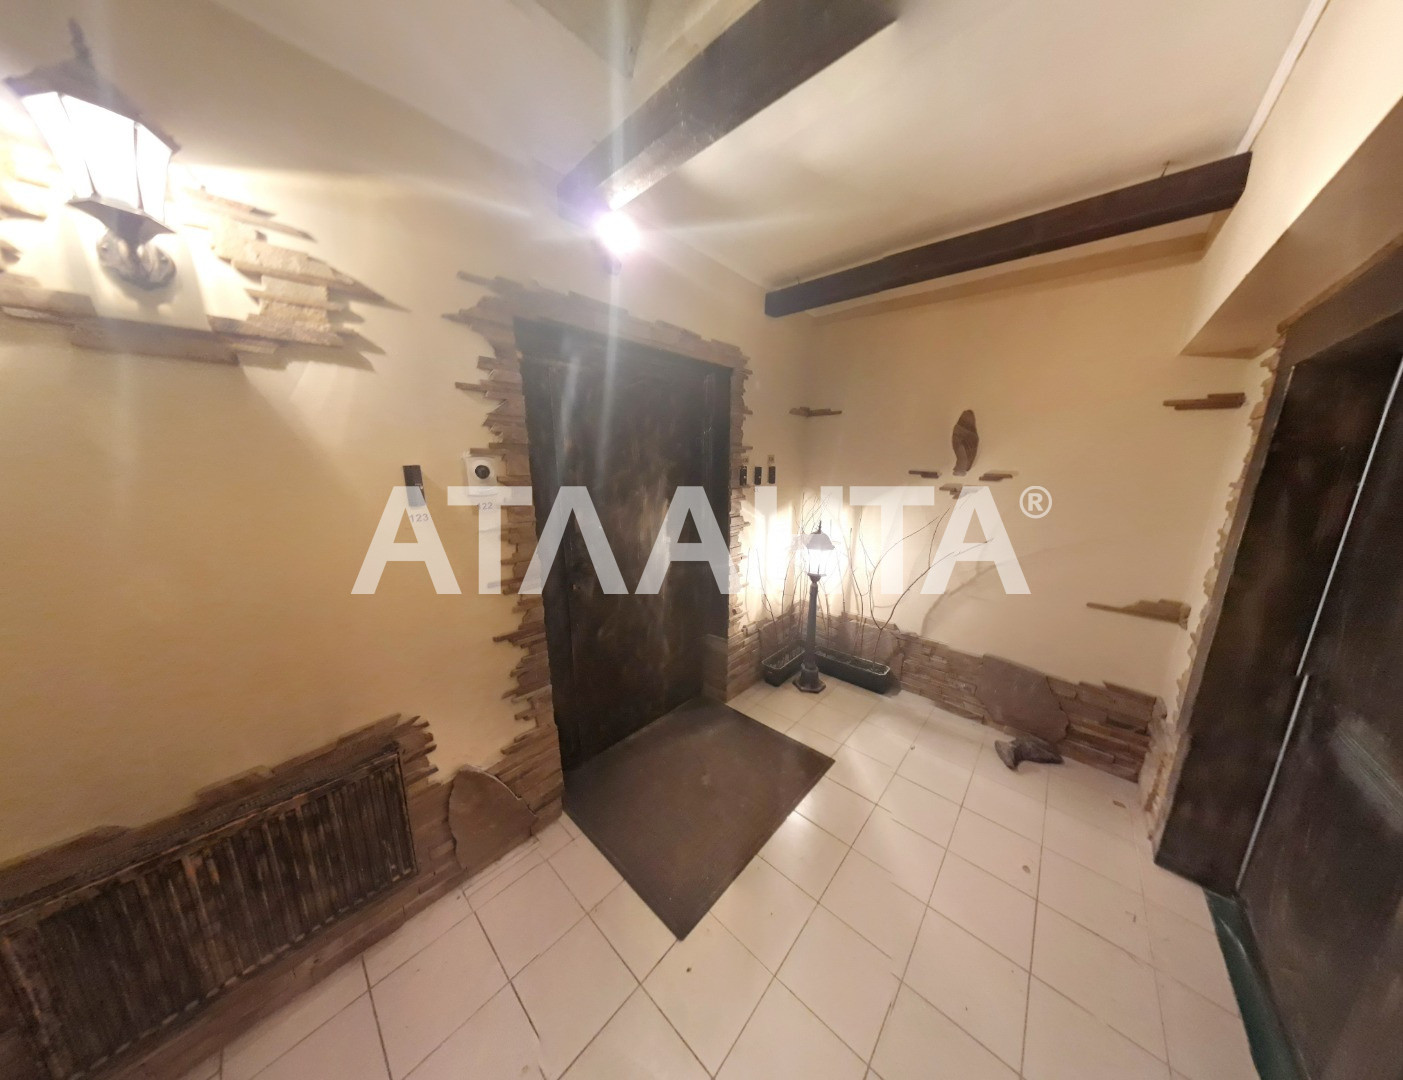 Продается 3-комнатная Квартира на ул. Ломоносова — 118 900 у.е. (фото №25)